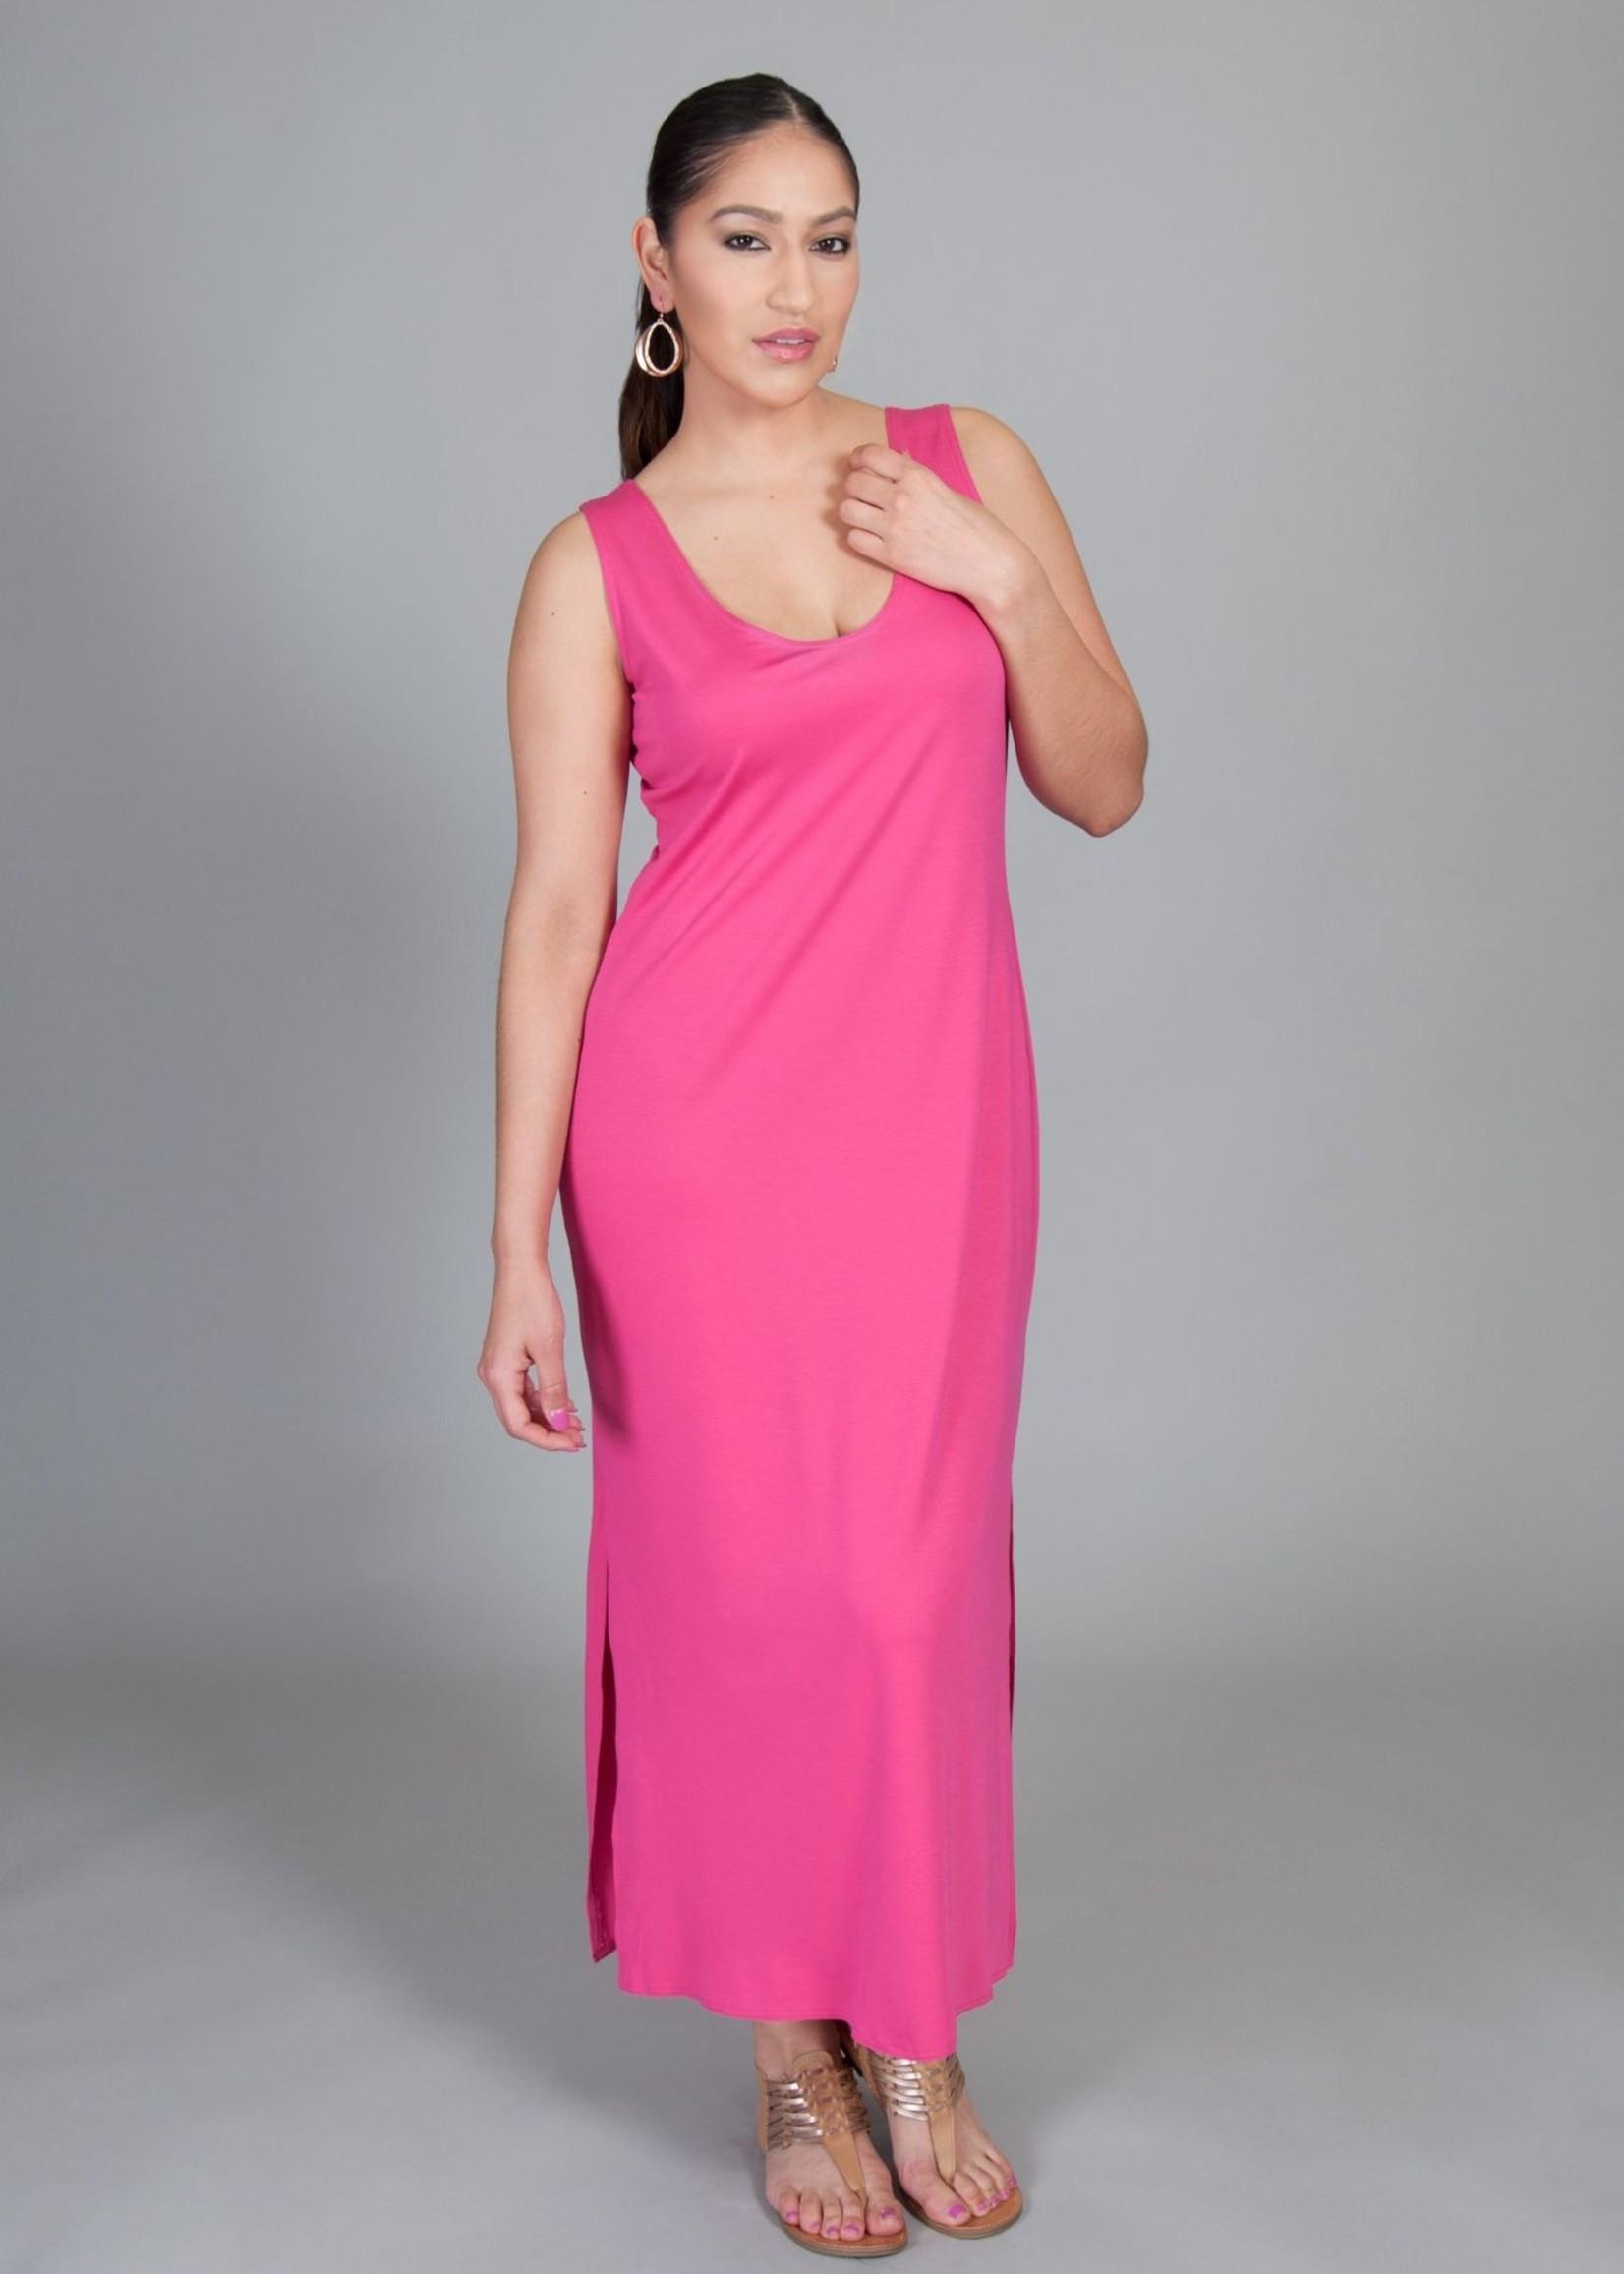 SARAH KUENYEFU LIGHT PONTE SHEATH DRESS